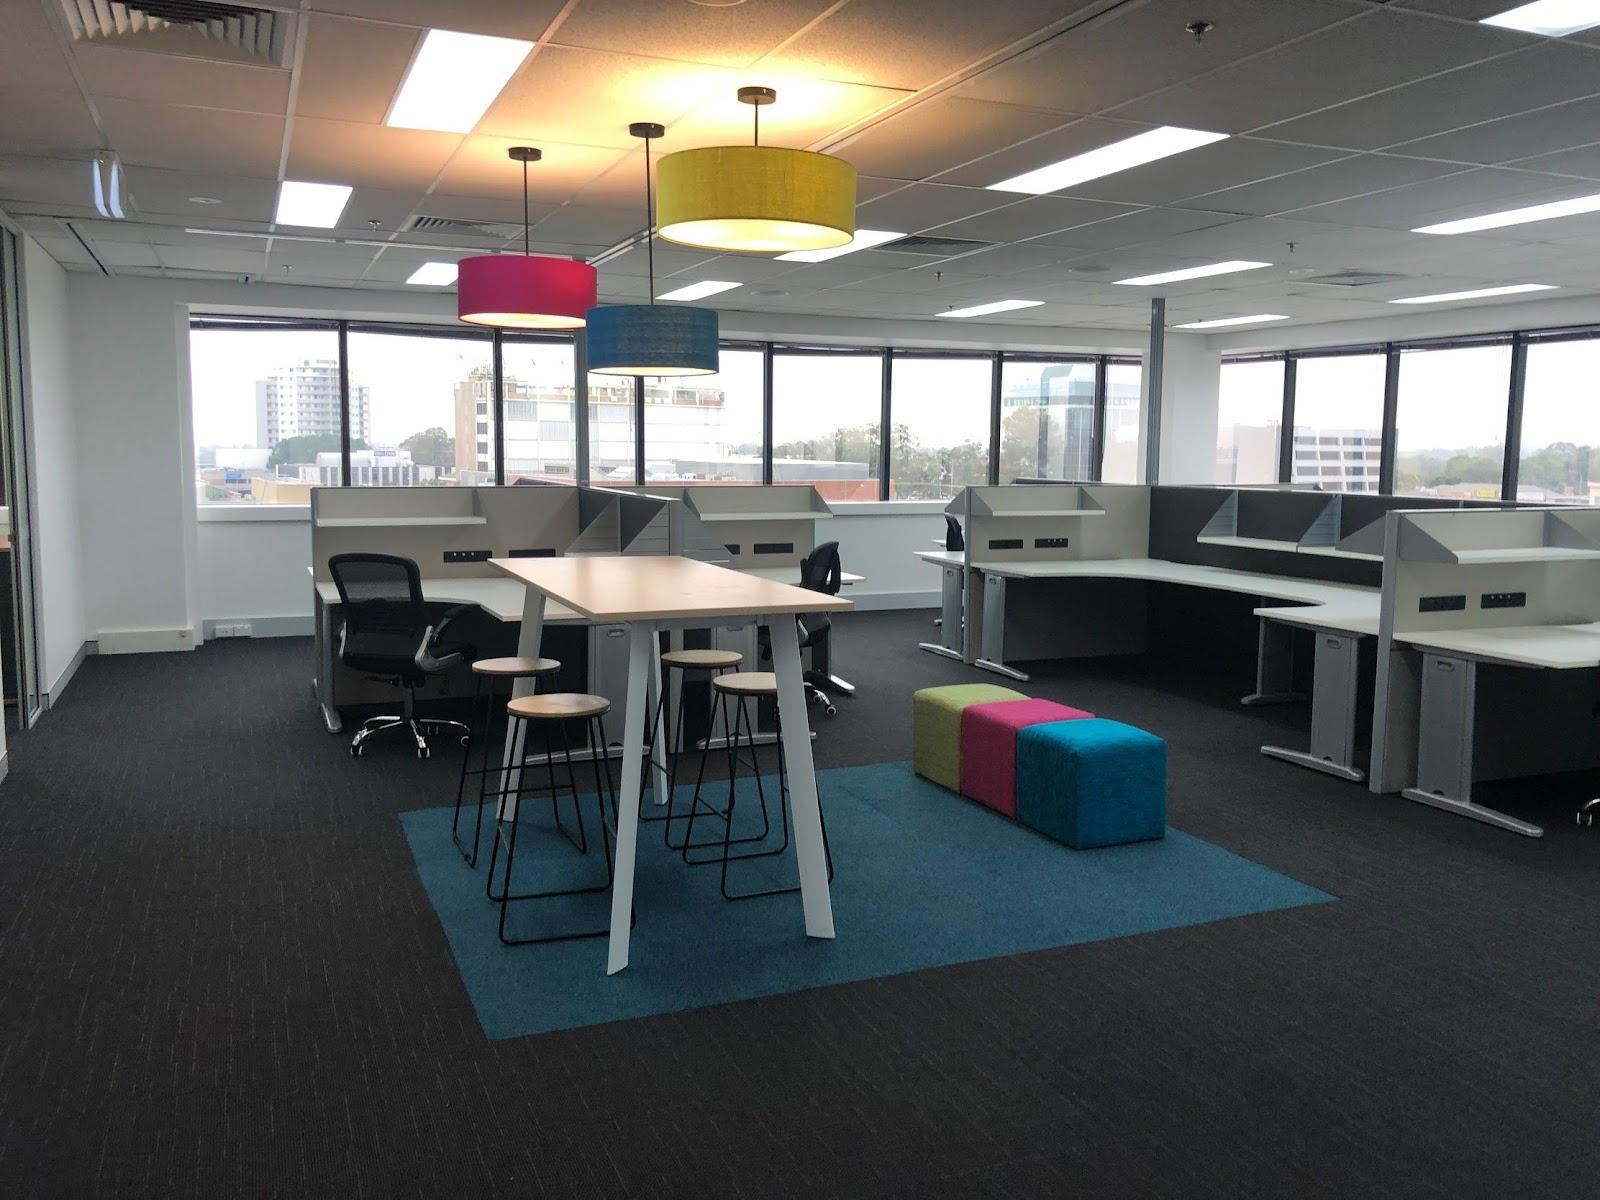 7 Best Coworking Space in Riyadh, Saudi Arabia [2020 List] 13